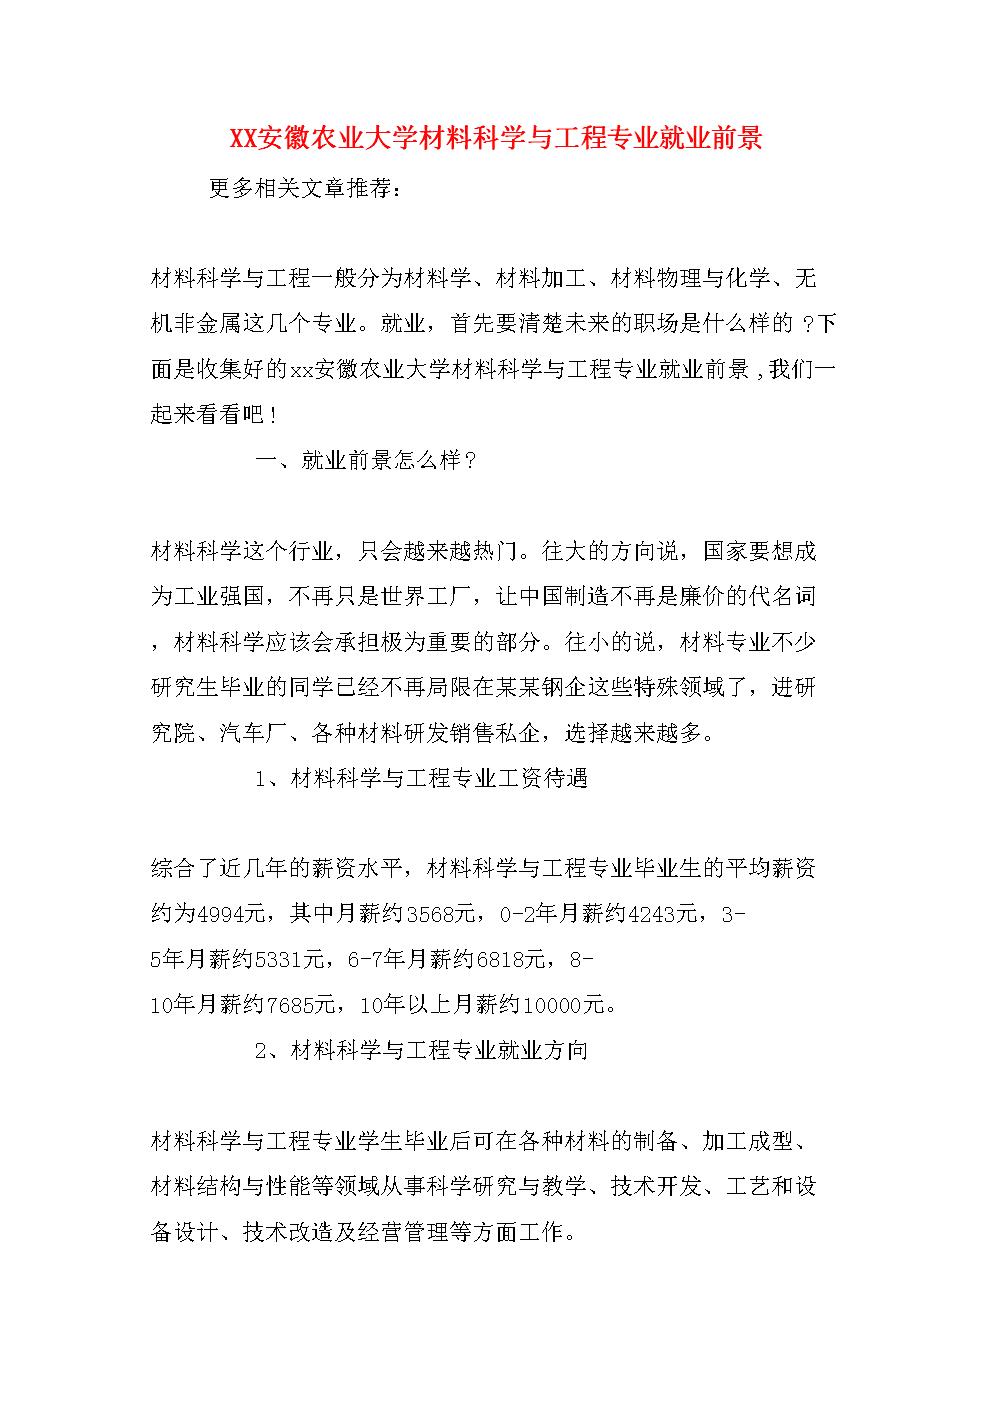 XX安徽农业大学材料科学与工程专业就业前景.doc